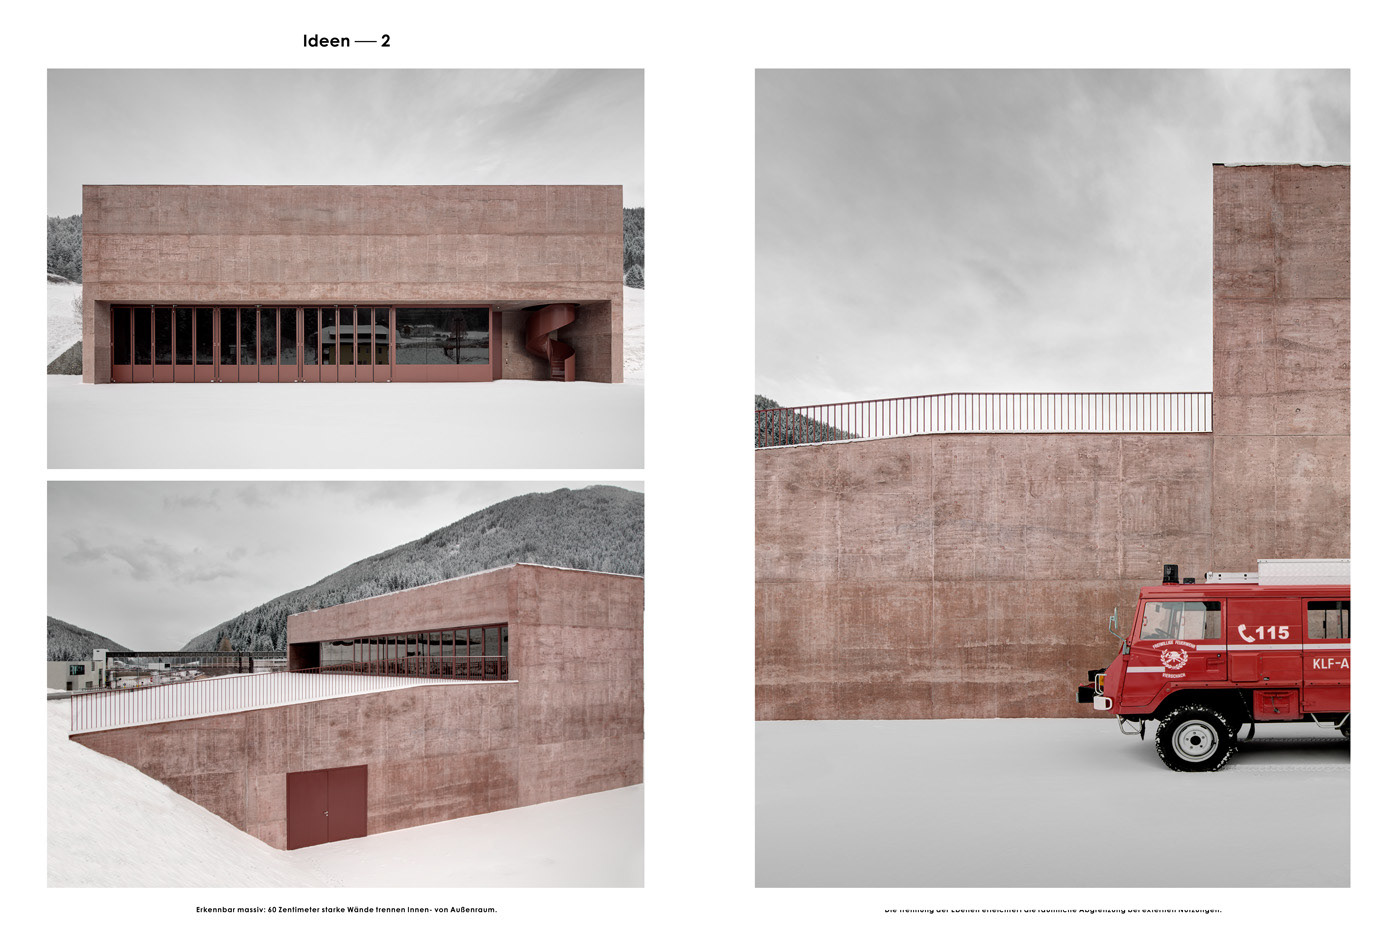 PEDEVILLA ARCHITECTS . - Baumeister Magazin - September 2016